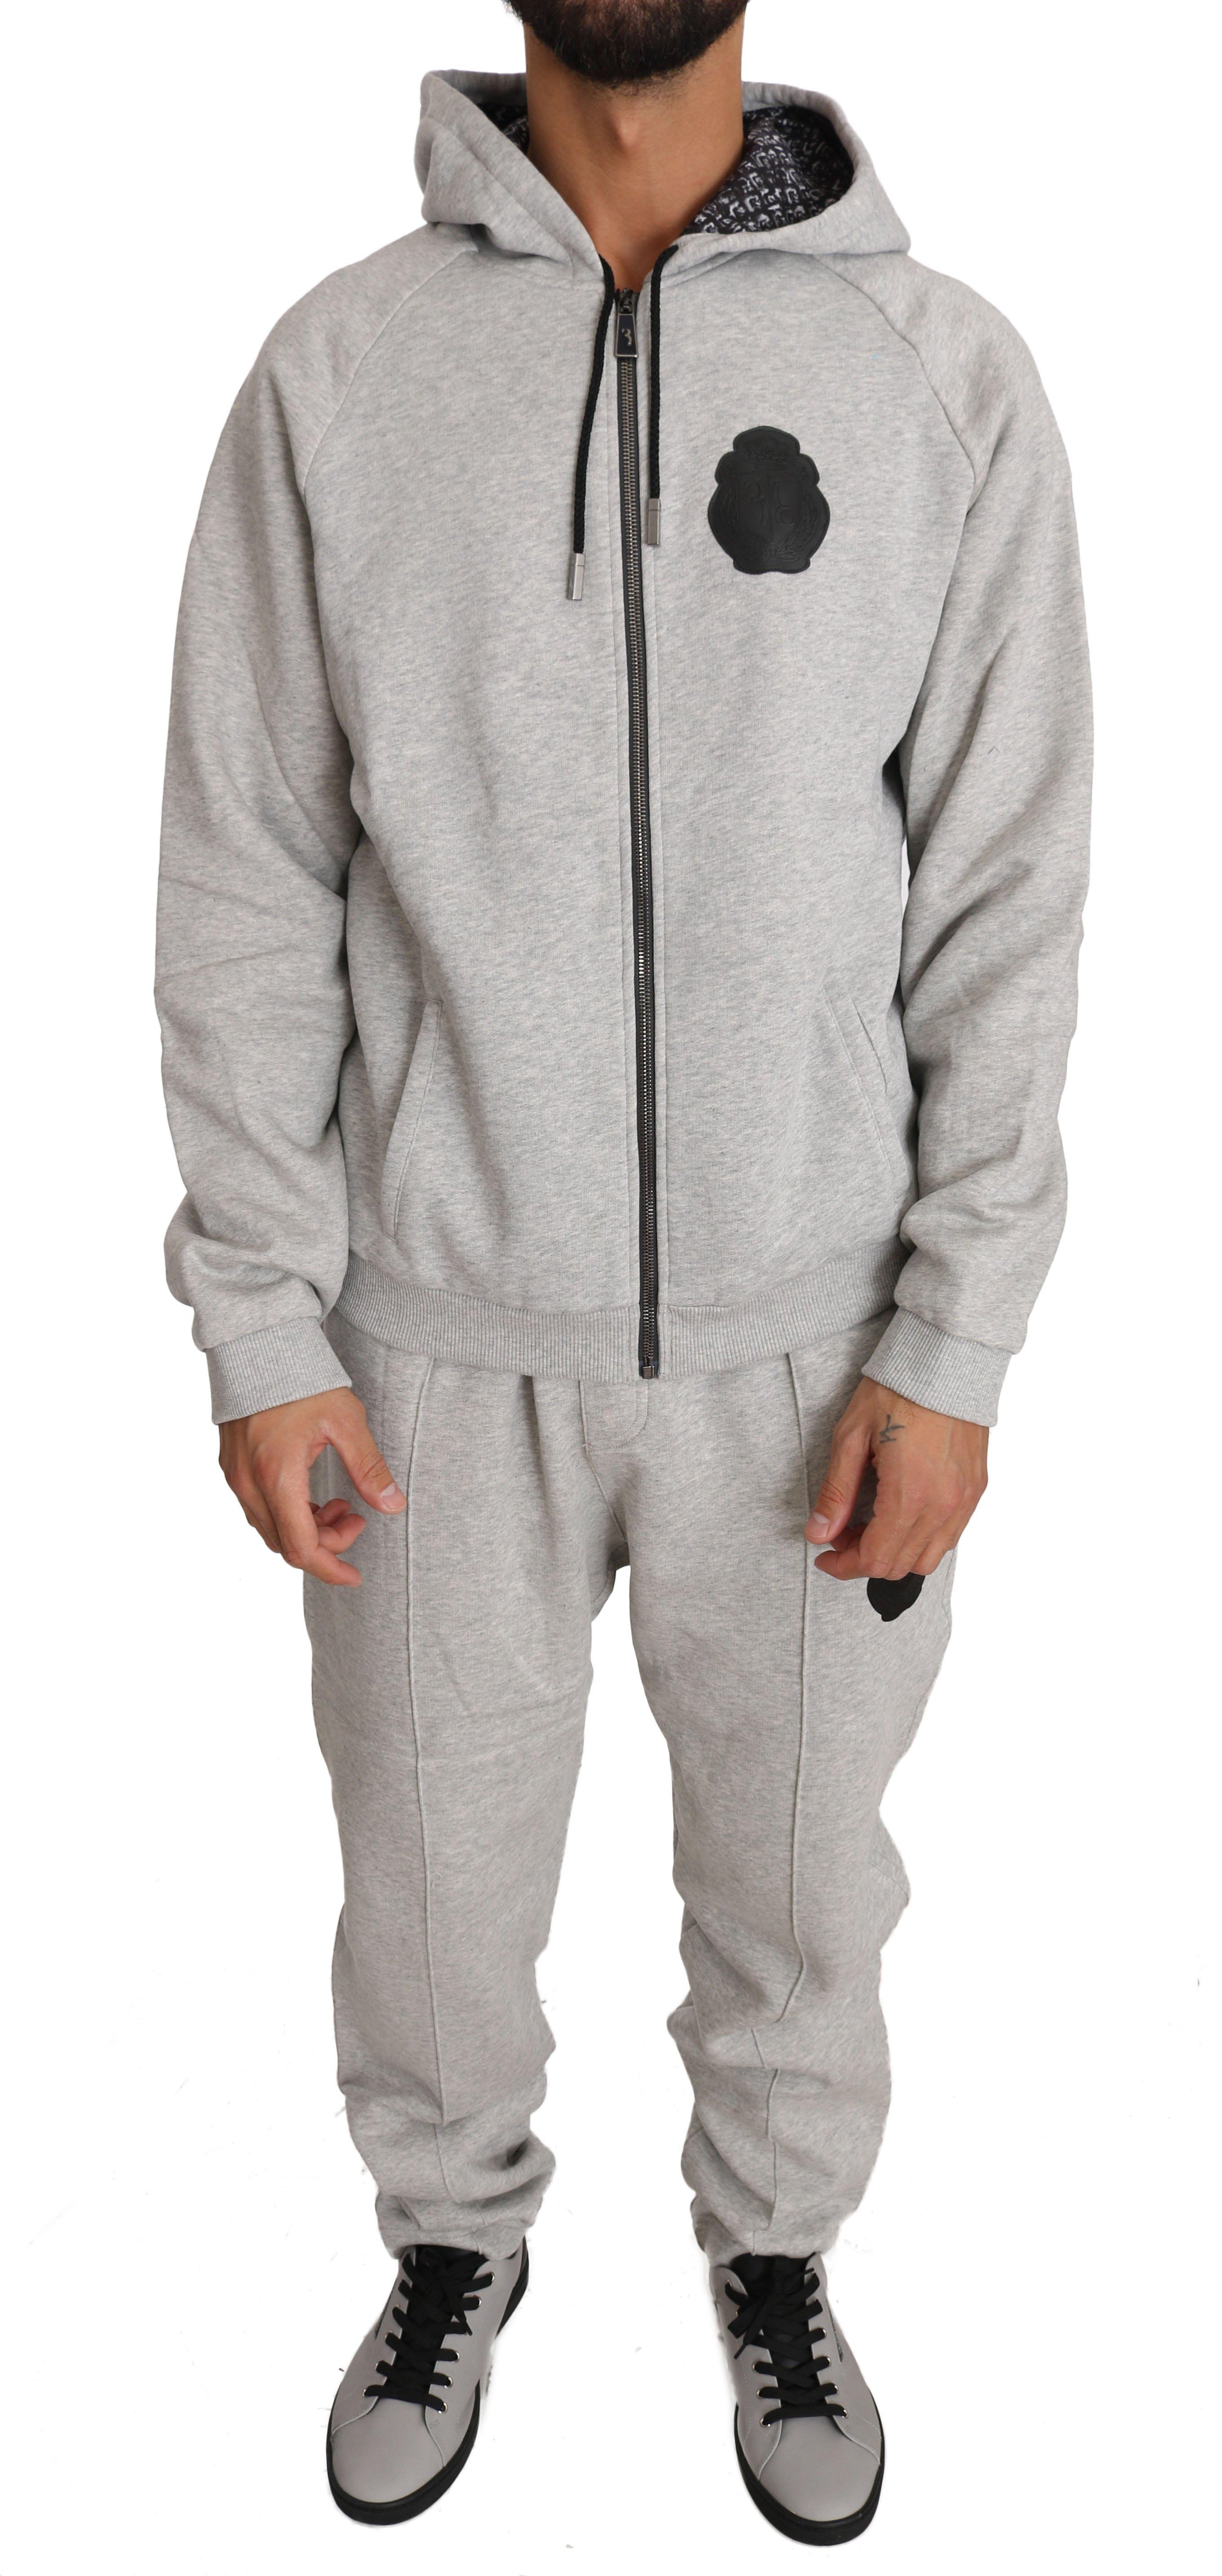 Billionaire Italian Couture Men's Hoodie Tracksuit Grey BIL1026 - XL